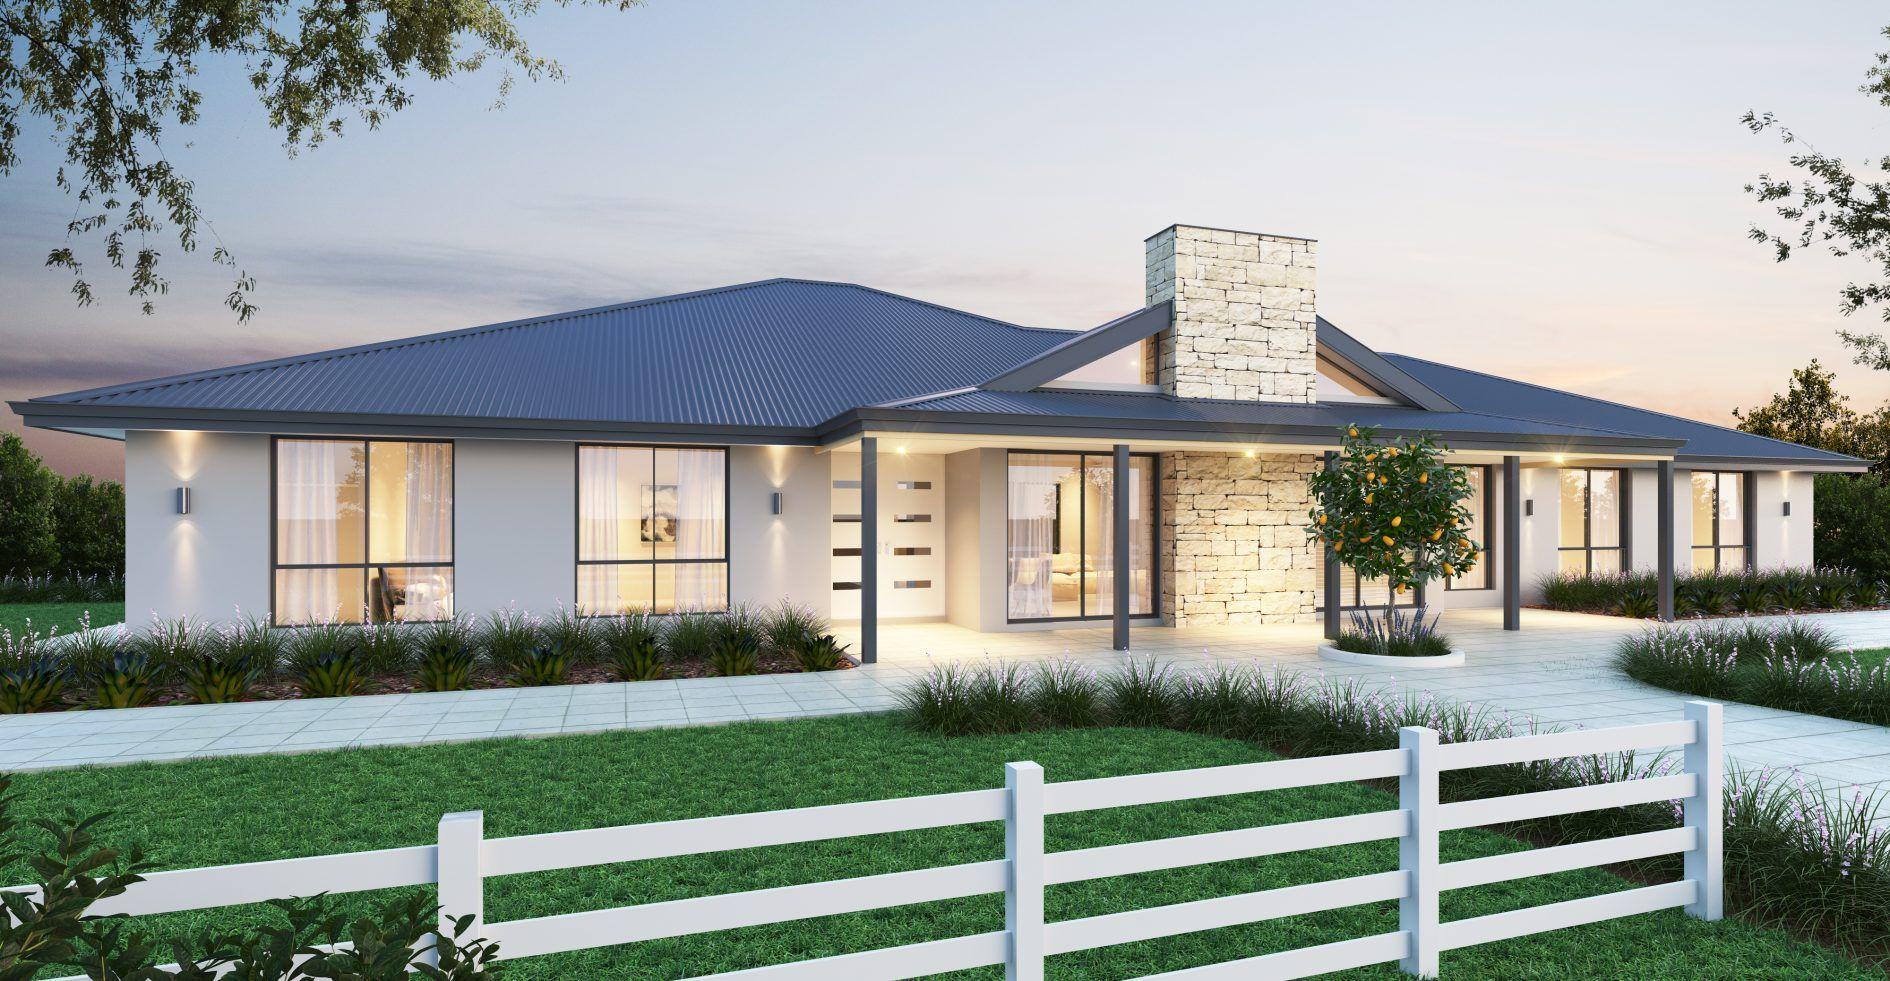 quindalup render   Homes & Homesteads   Pinterest   Grundrisse ...